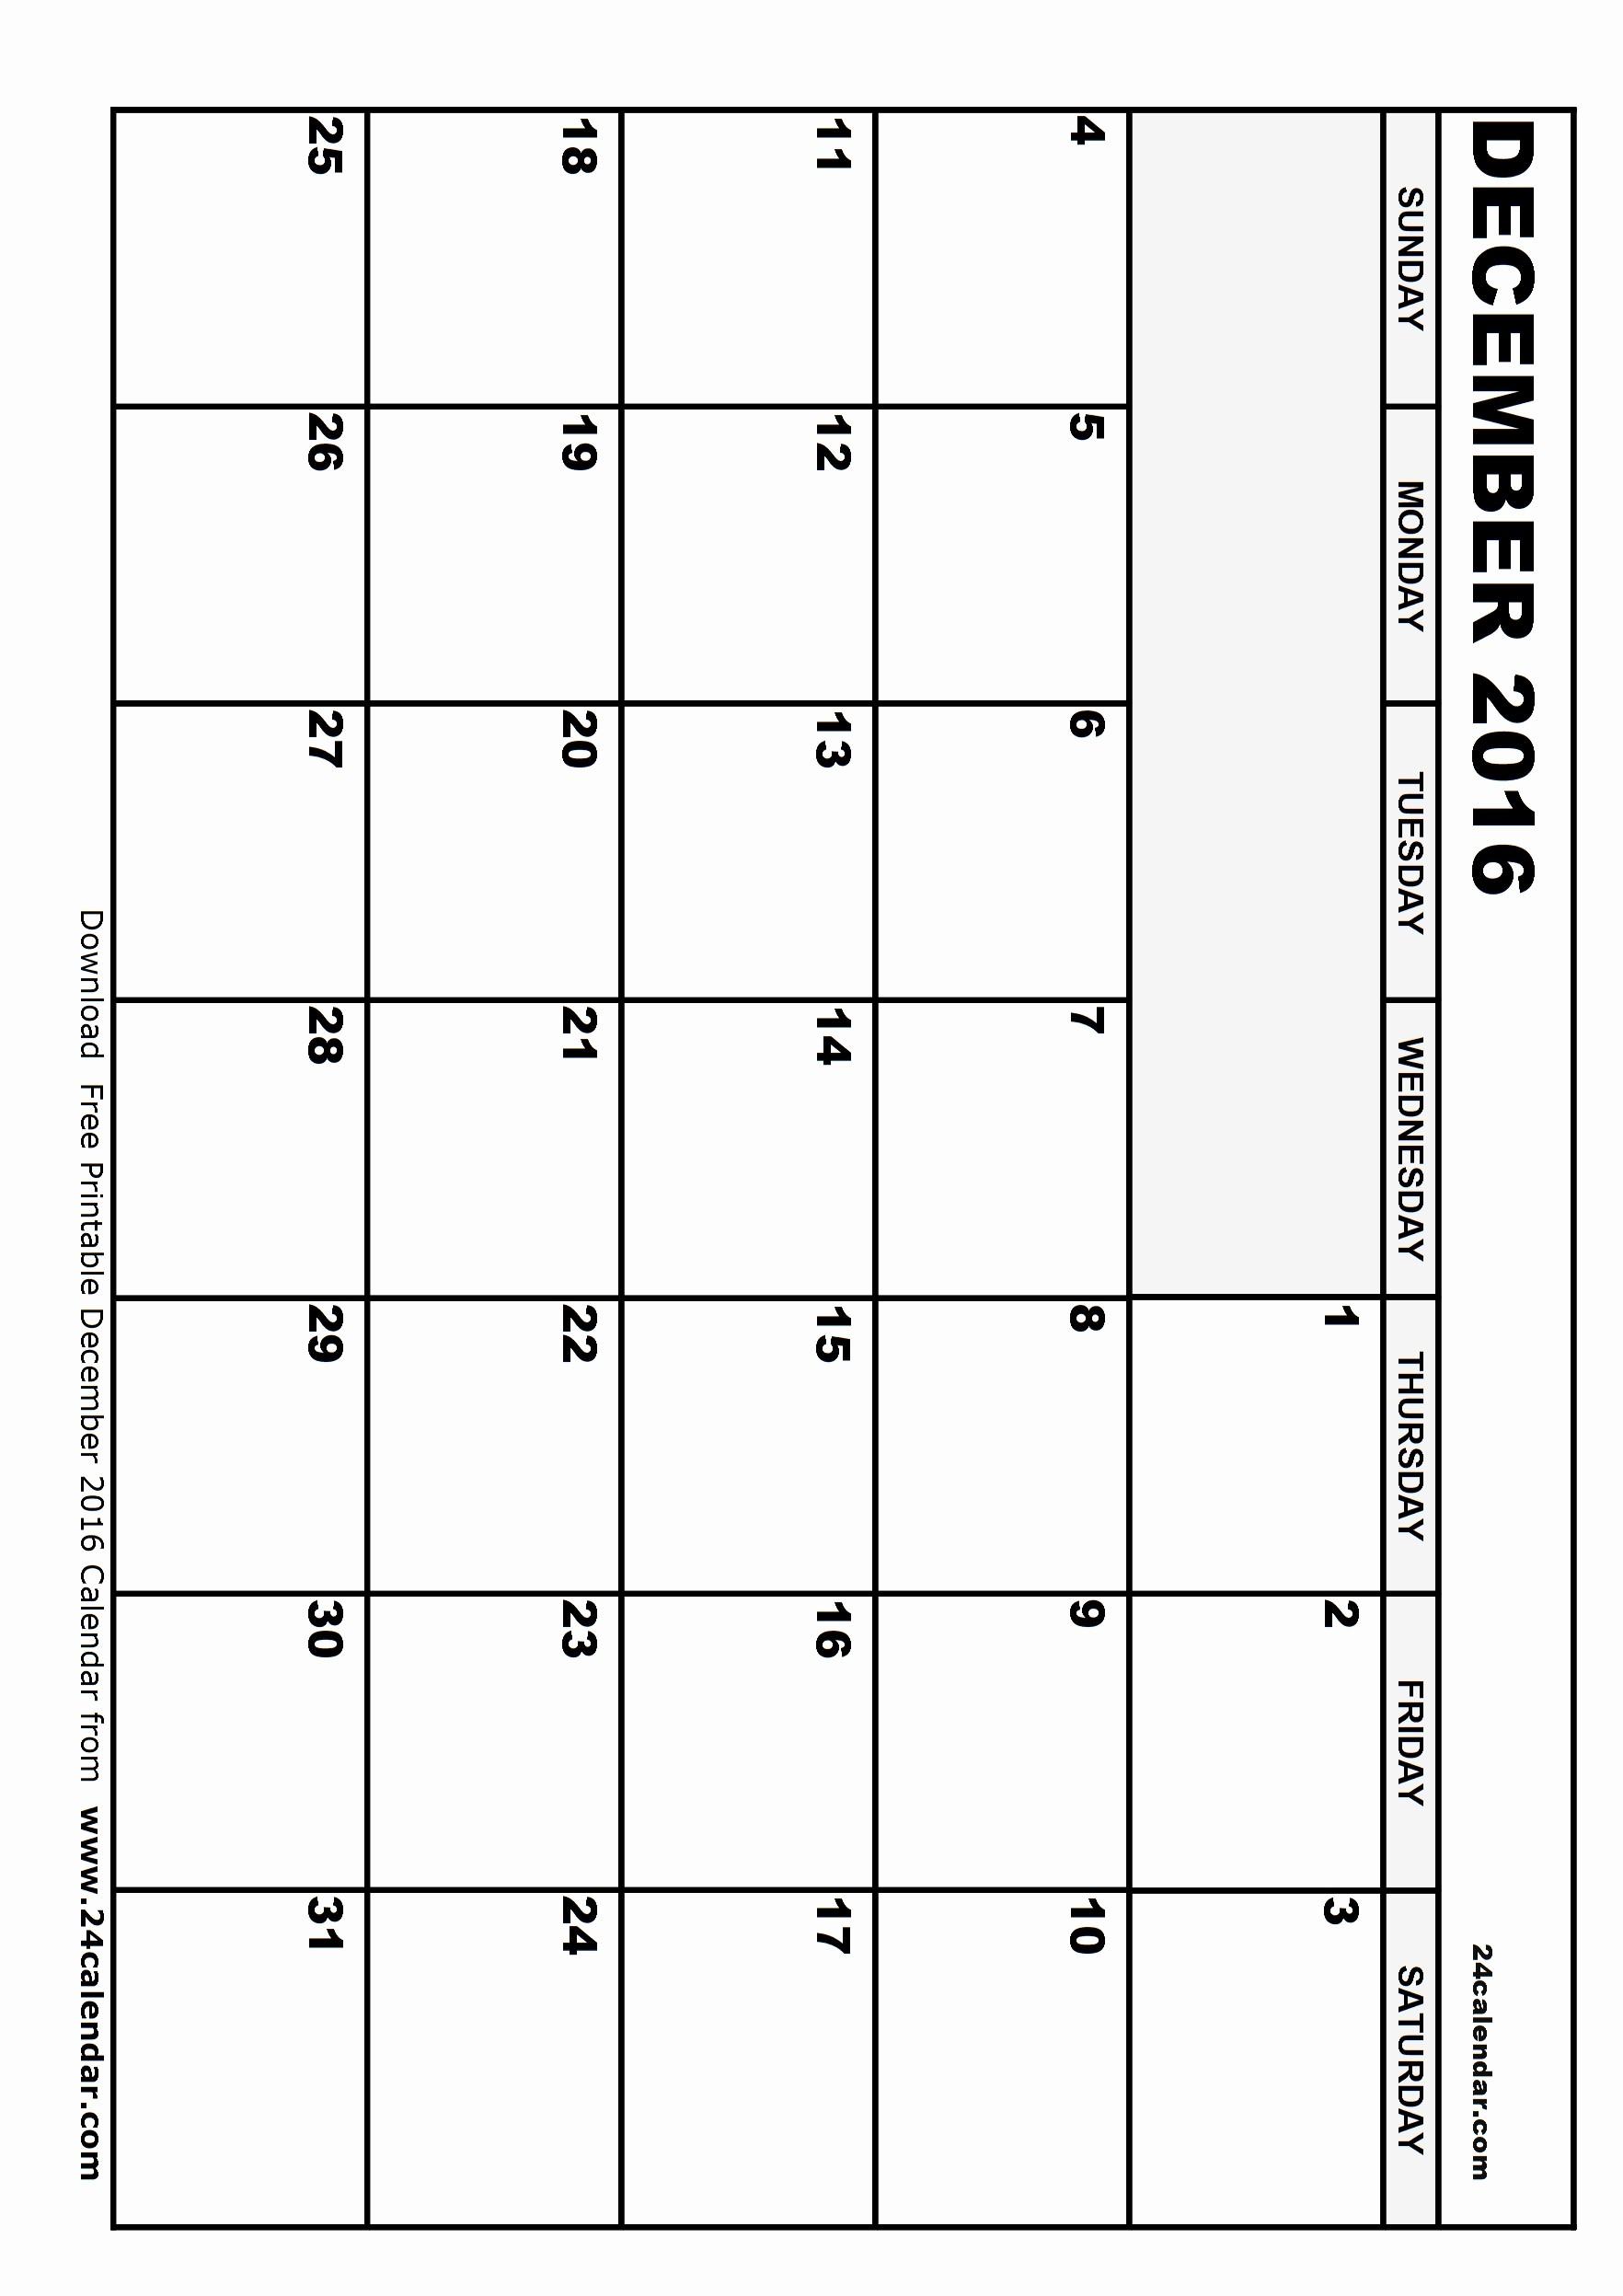 Blank December Calendar 2016 Printable Fresh Blank December 2016 Calendar In Printable format